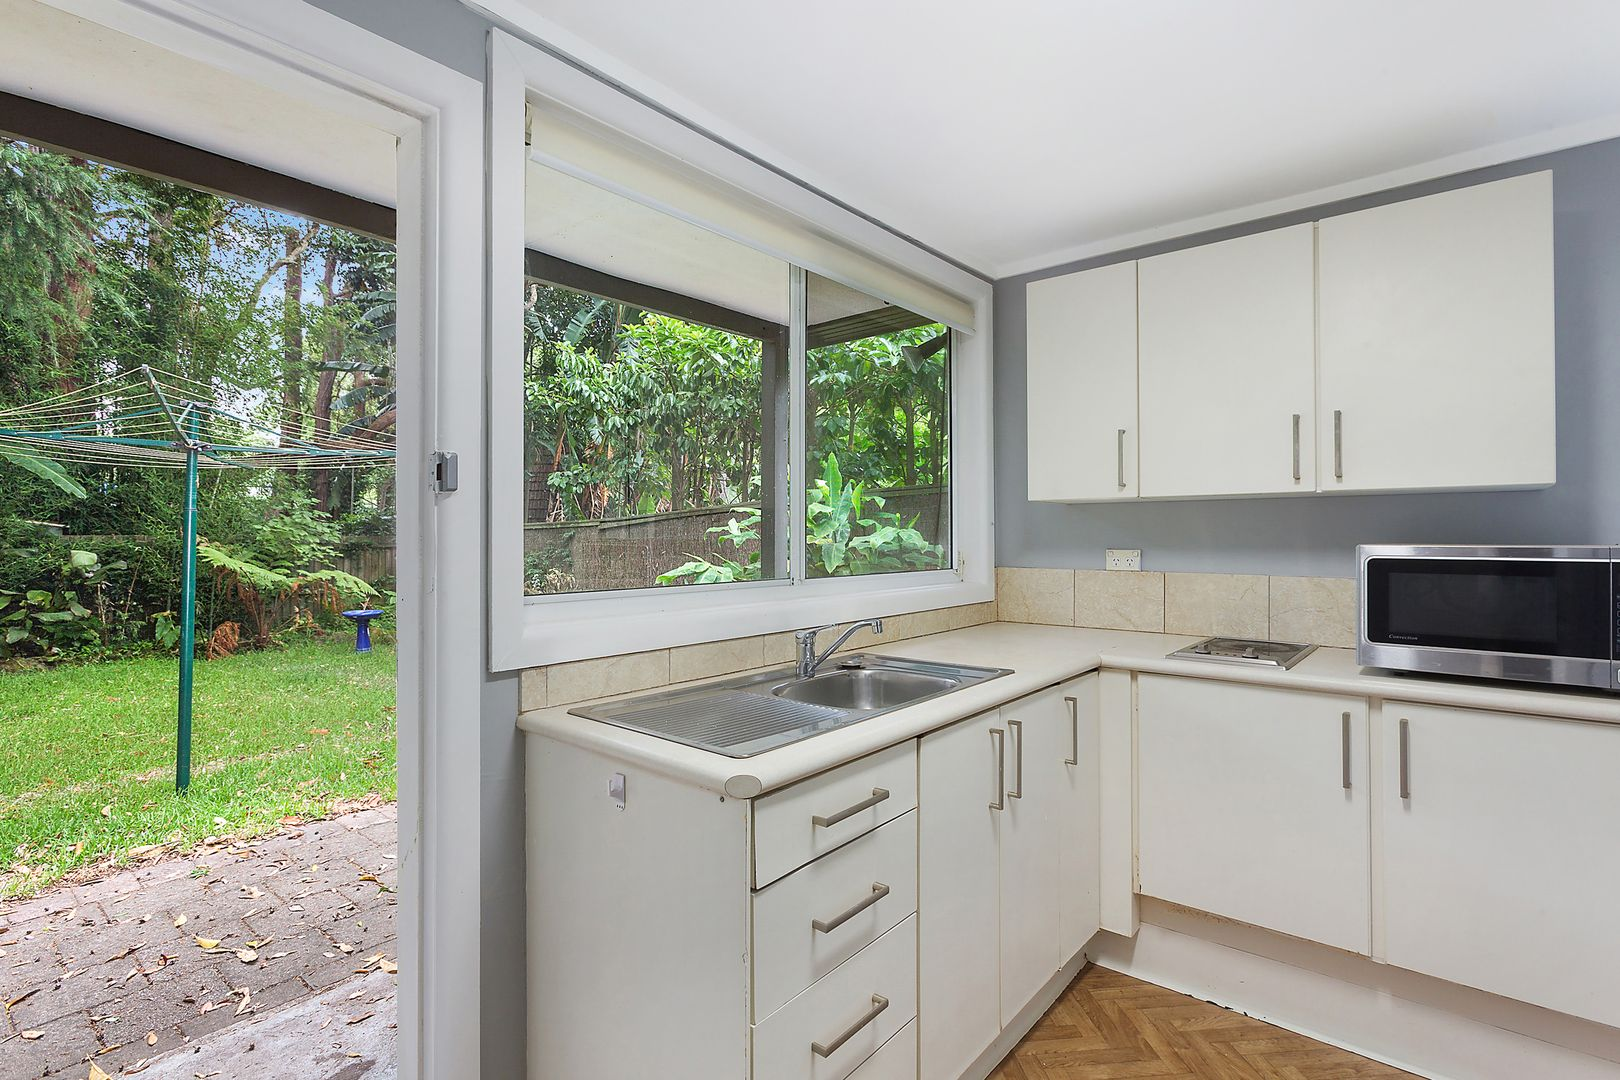 2/21 Water Street, Wahroonga NSW 2076, Image 1